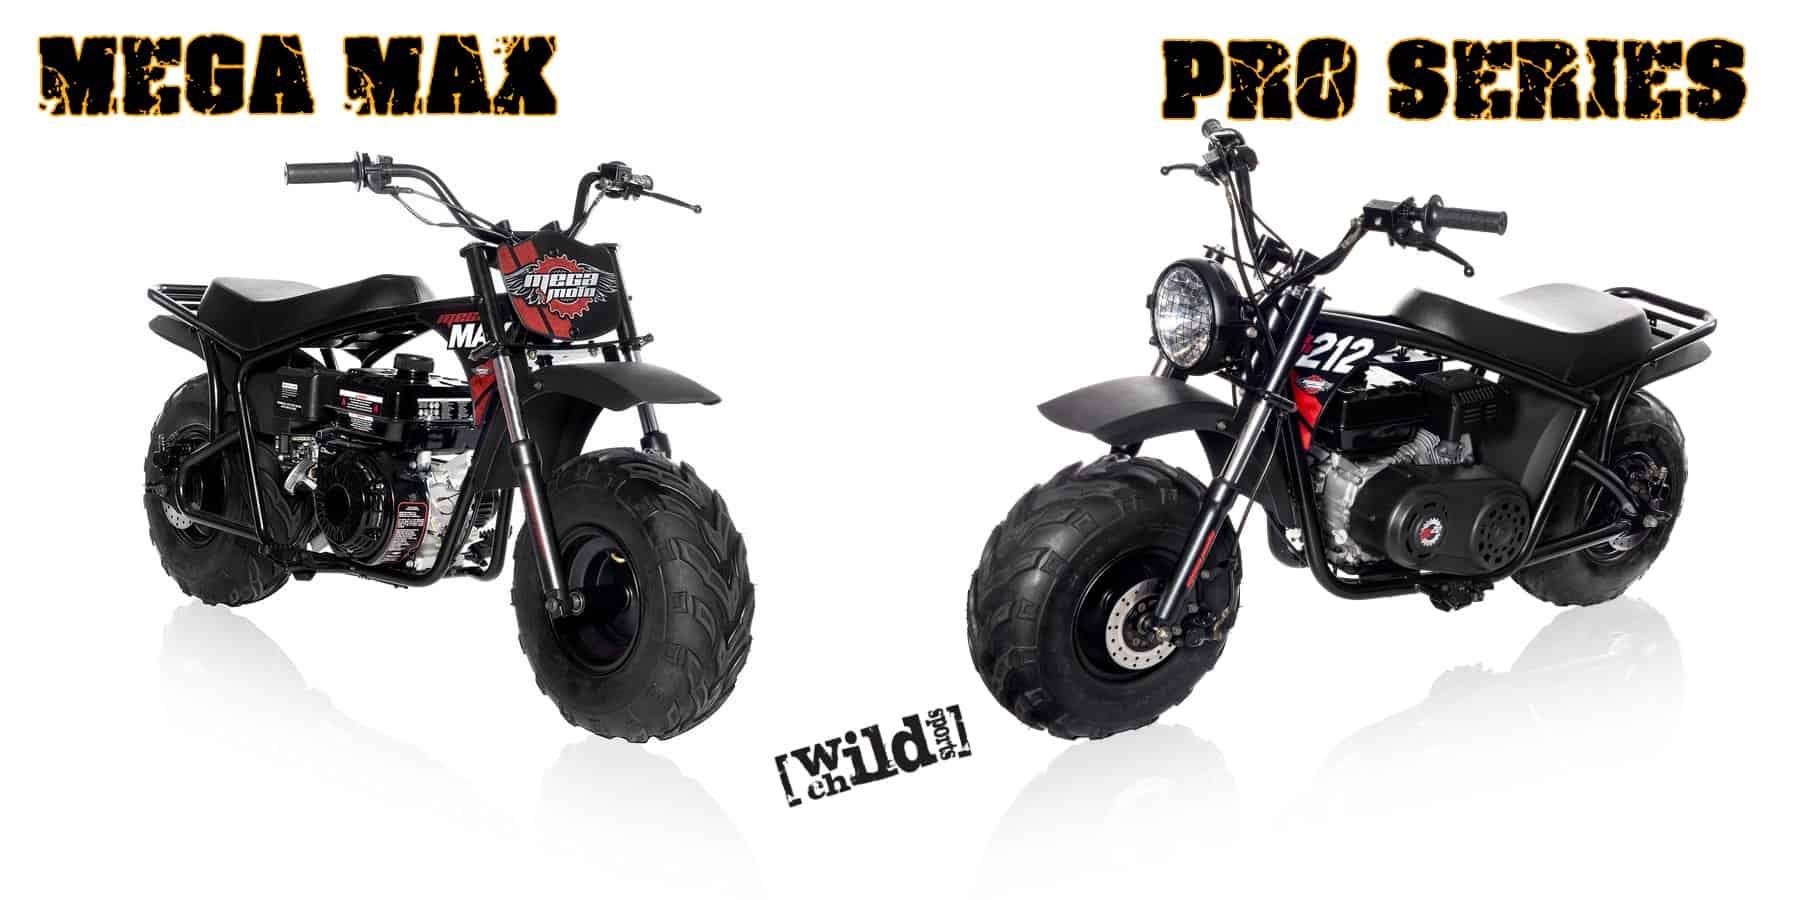 mega moto 212 cc mini bikes